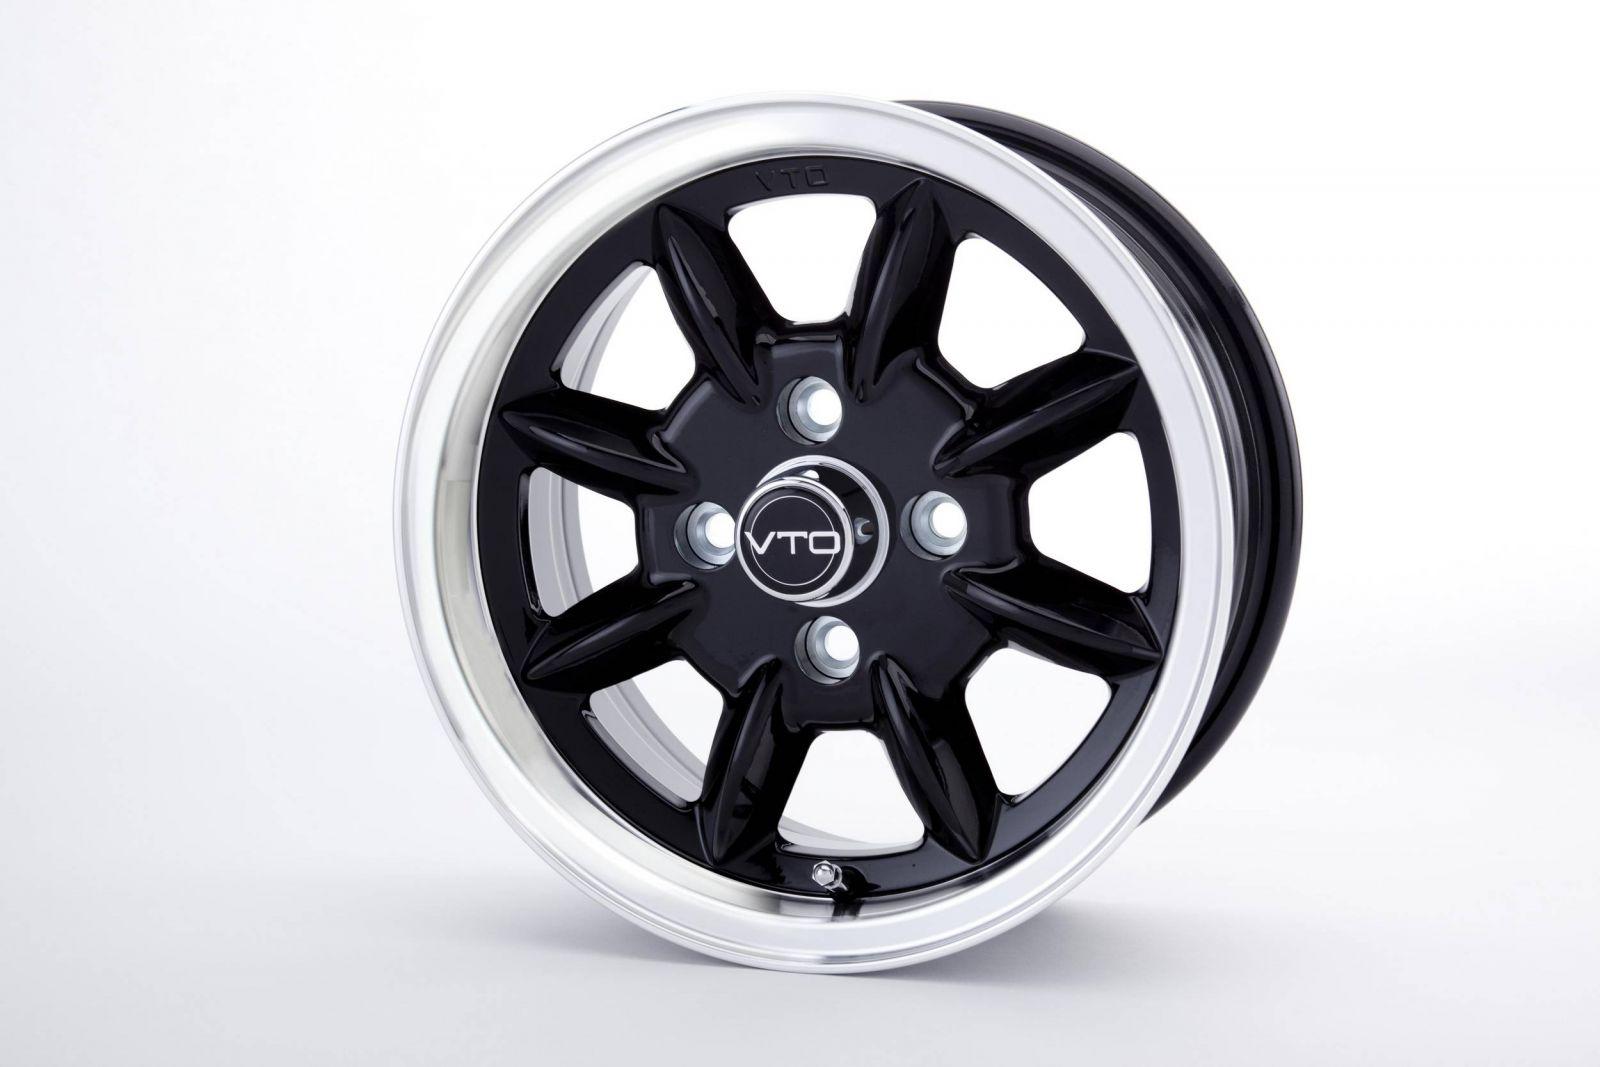 VTO Wheels - Classic 8 & Retro 4